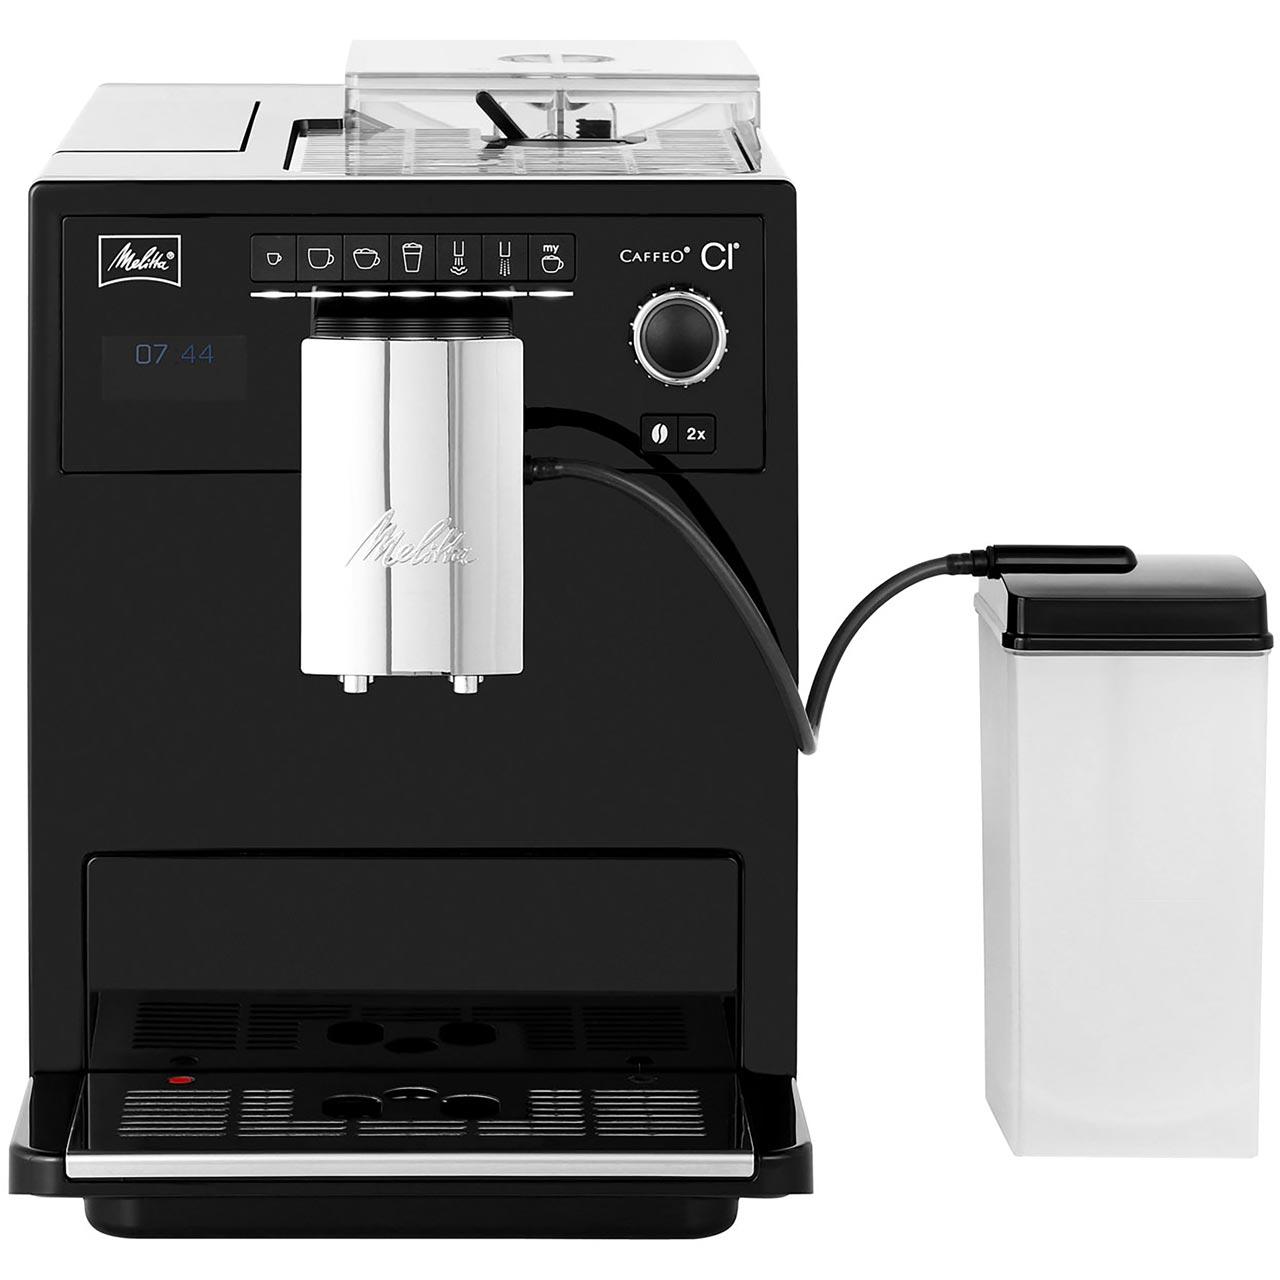 Melitta Caffeo Ci 6581404 Bean To Cup Coffee Machine Black